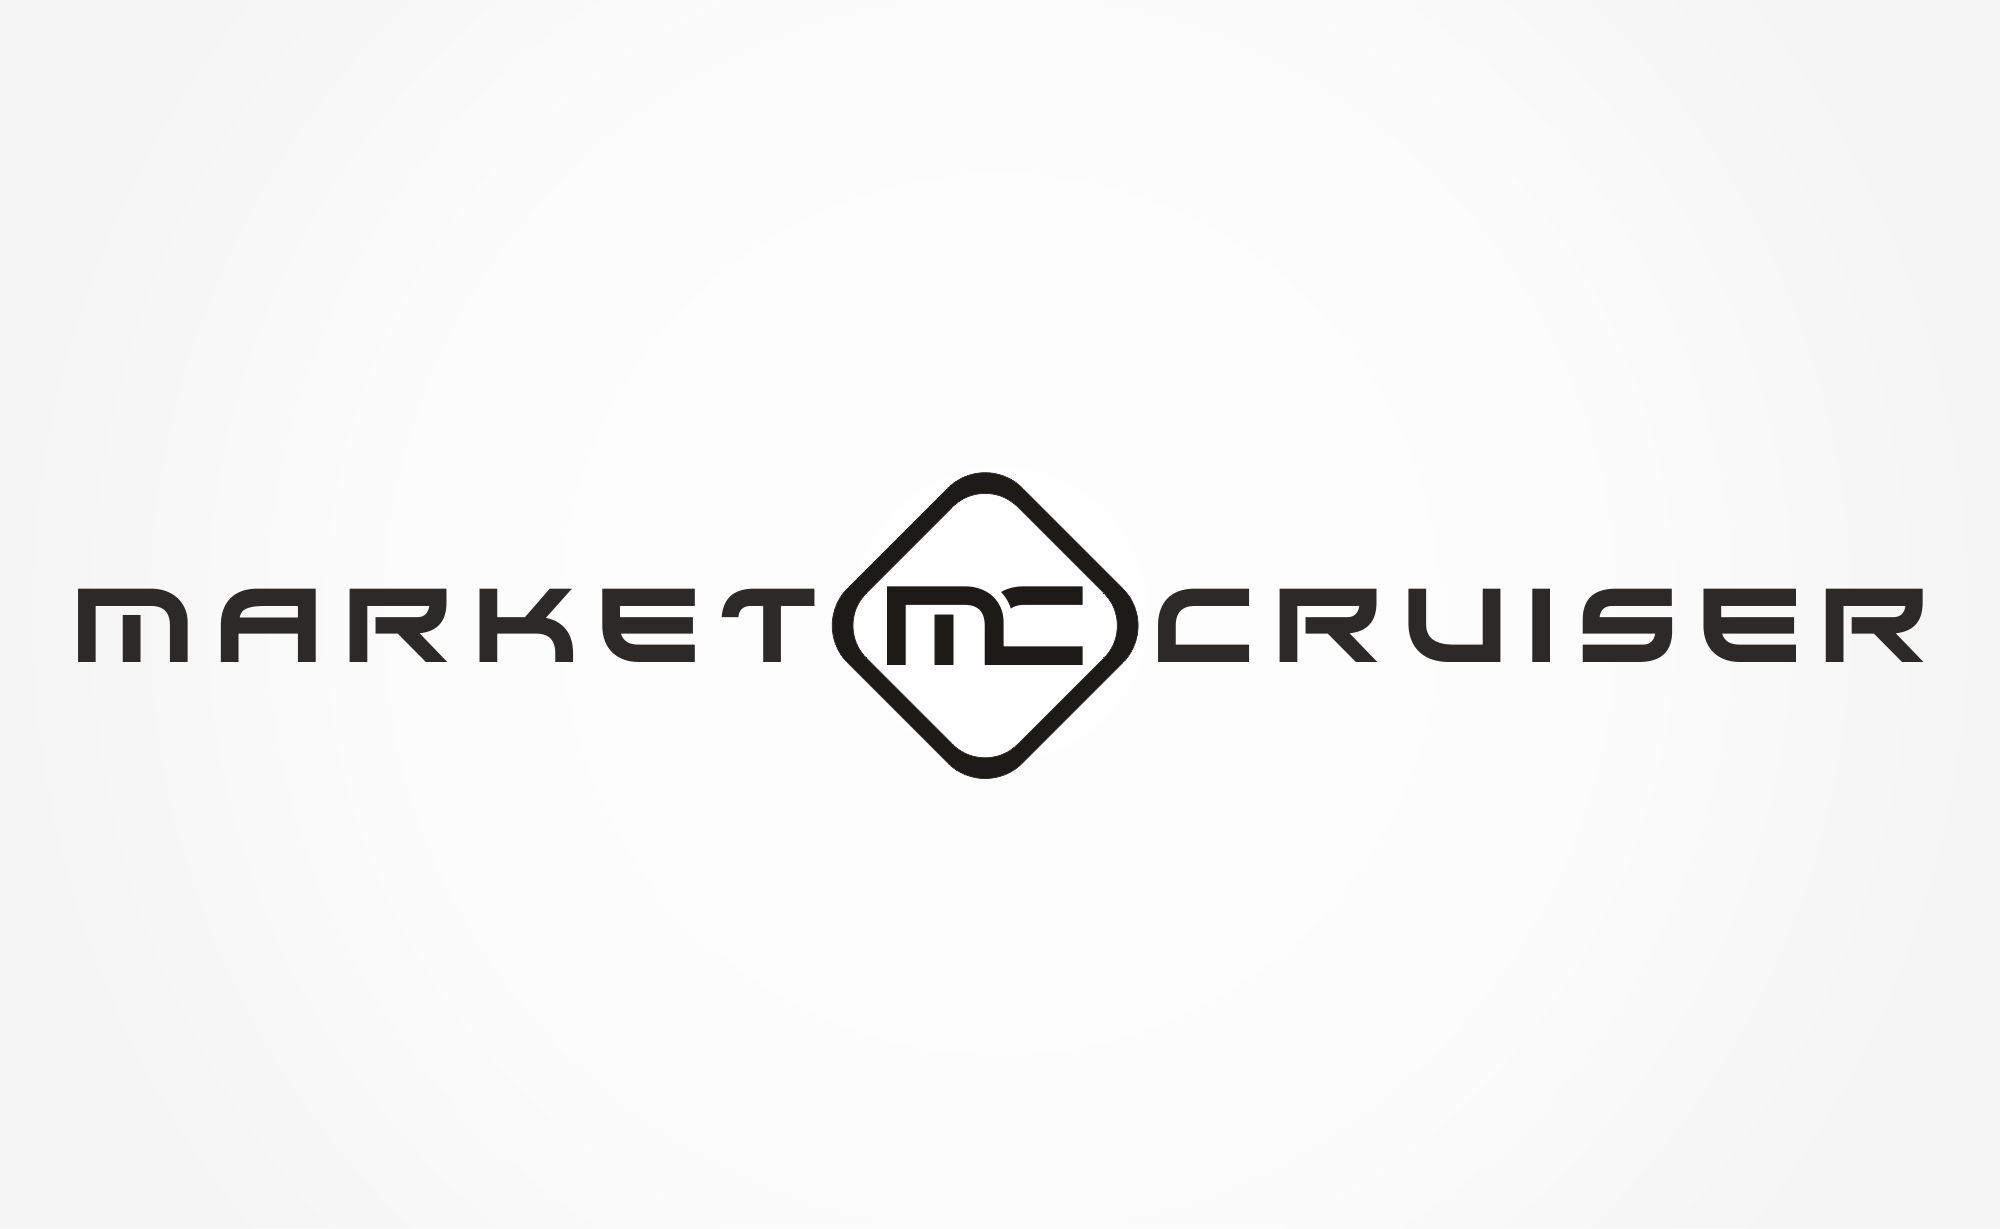 Create a new logo for Market Cruiser